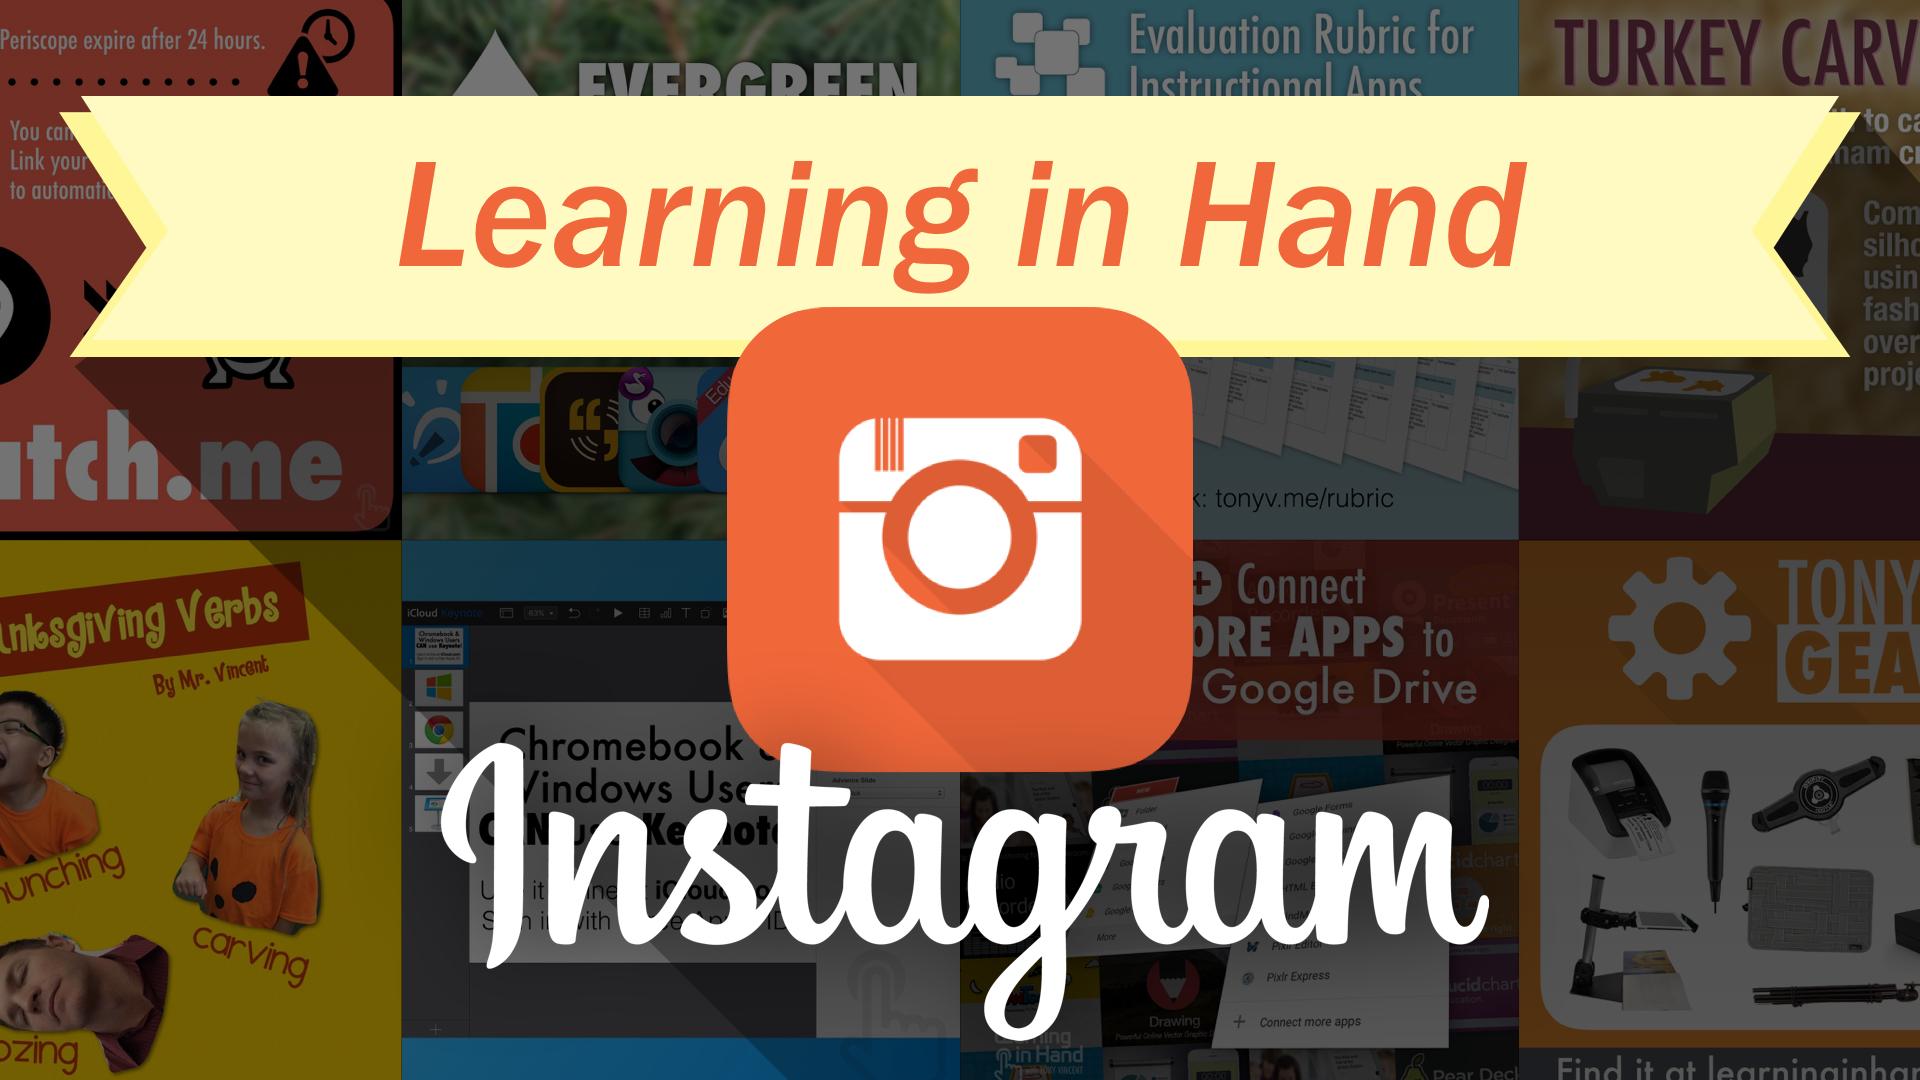 Learning in Hand Instagram